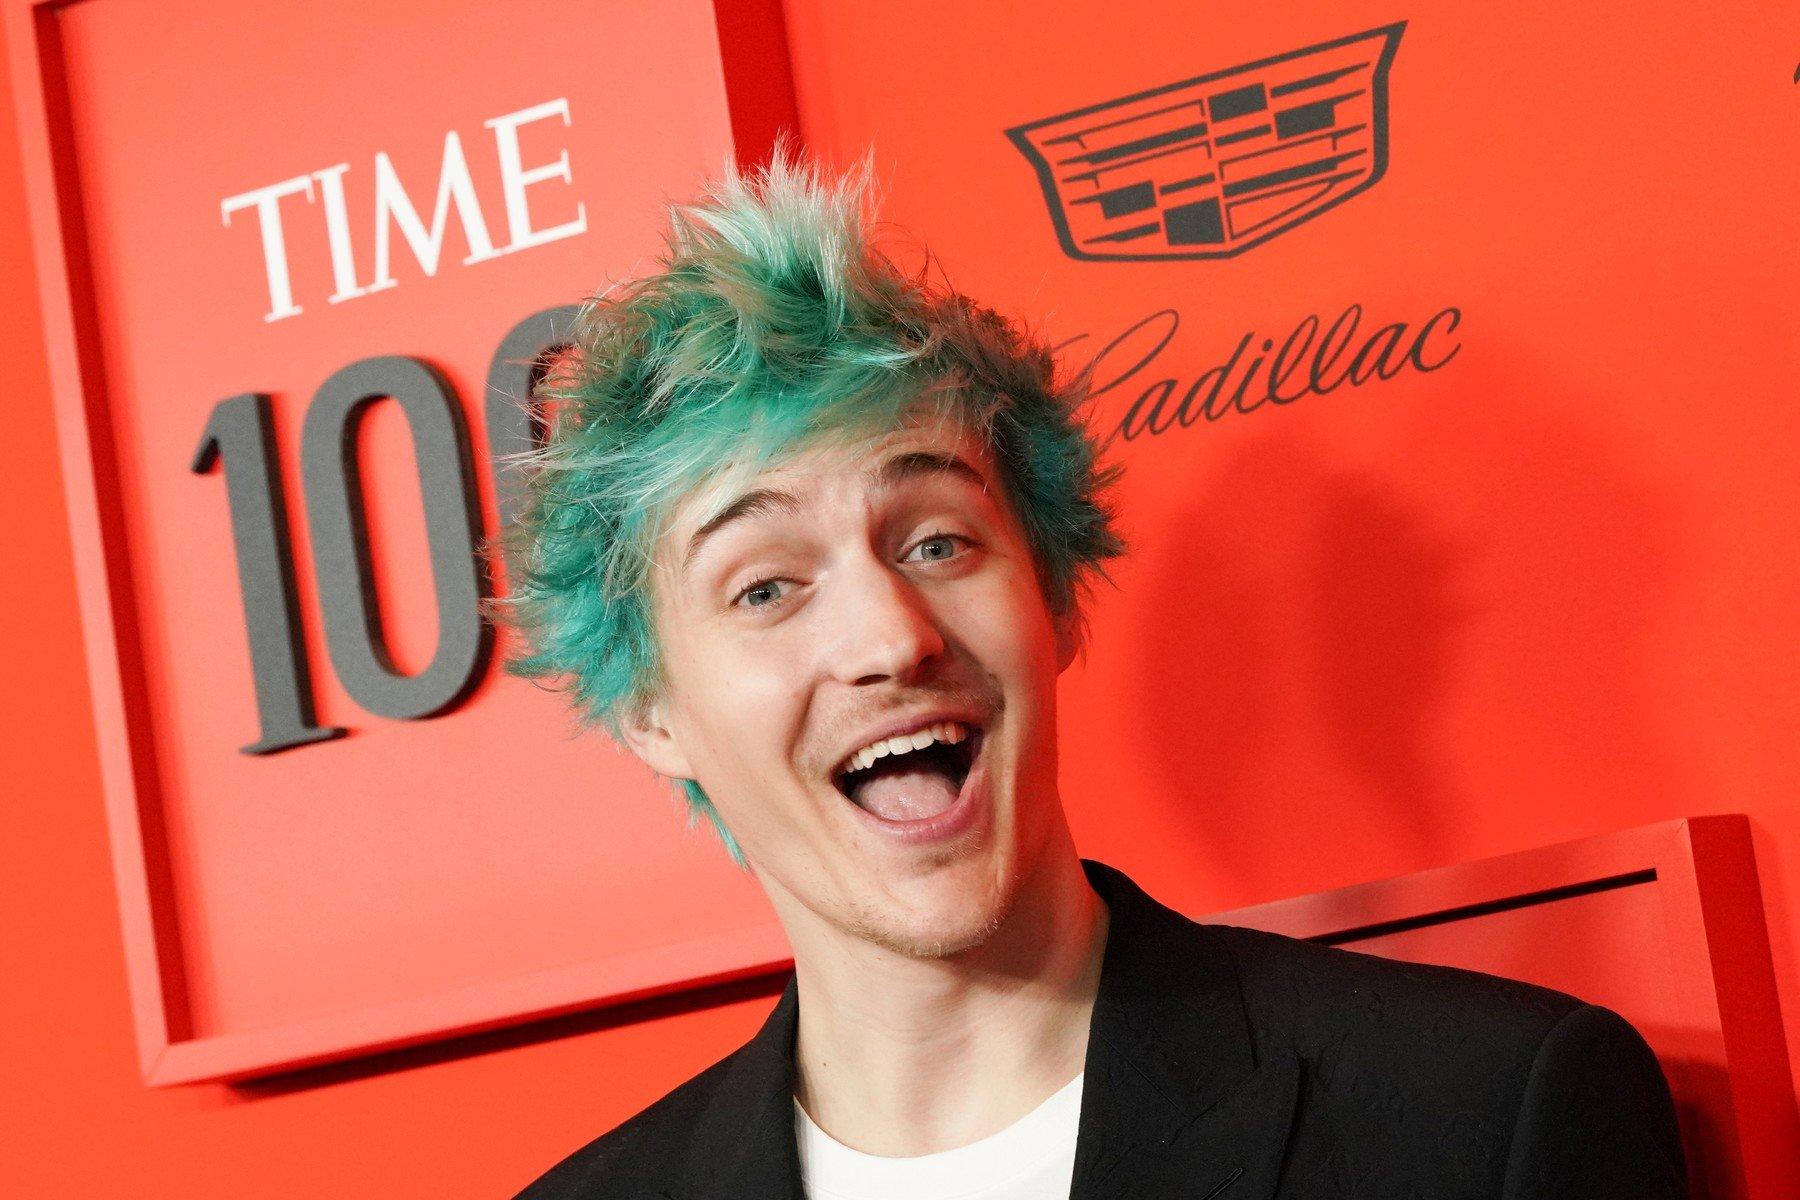 Tyler 'Ninja' Blevins (27) profesionalni igrač videoigara